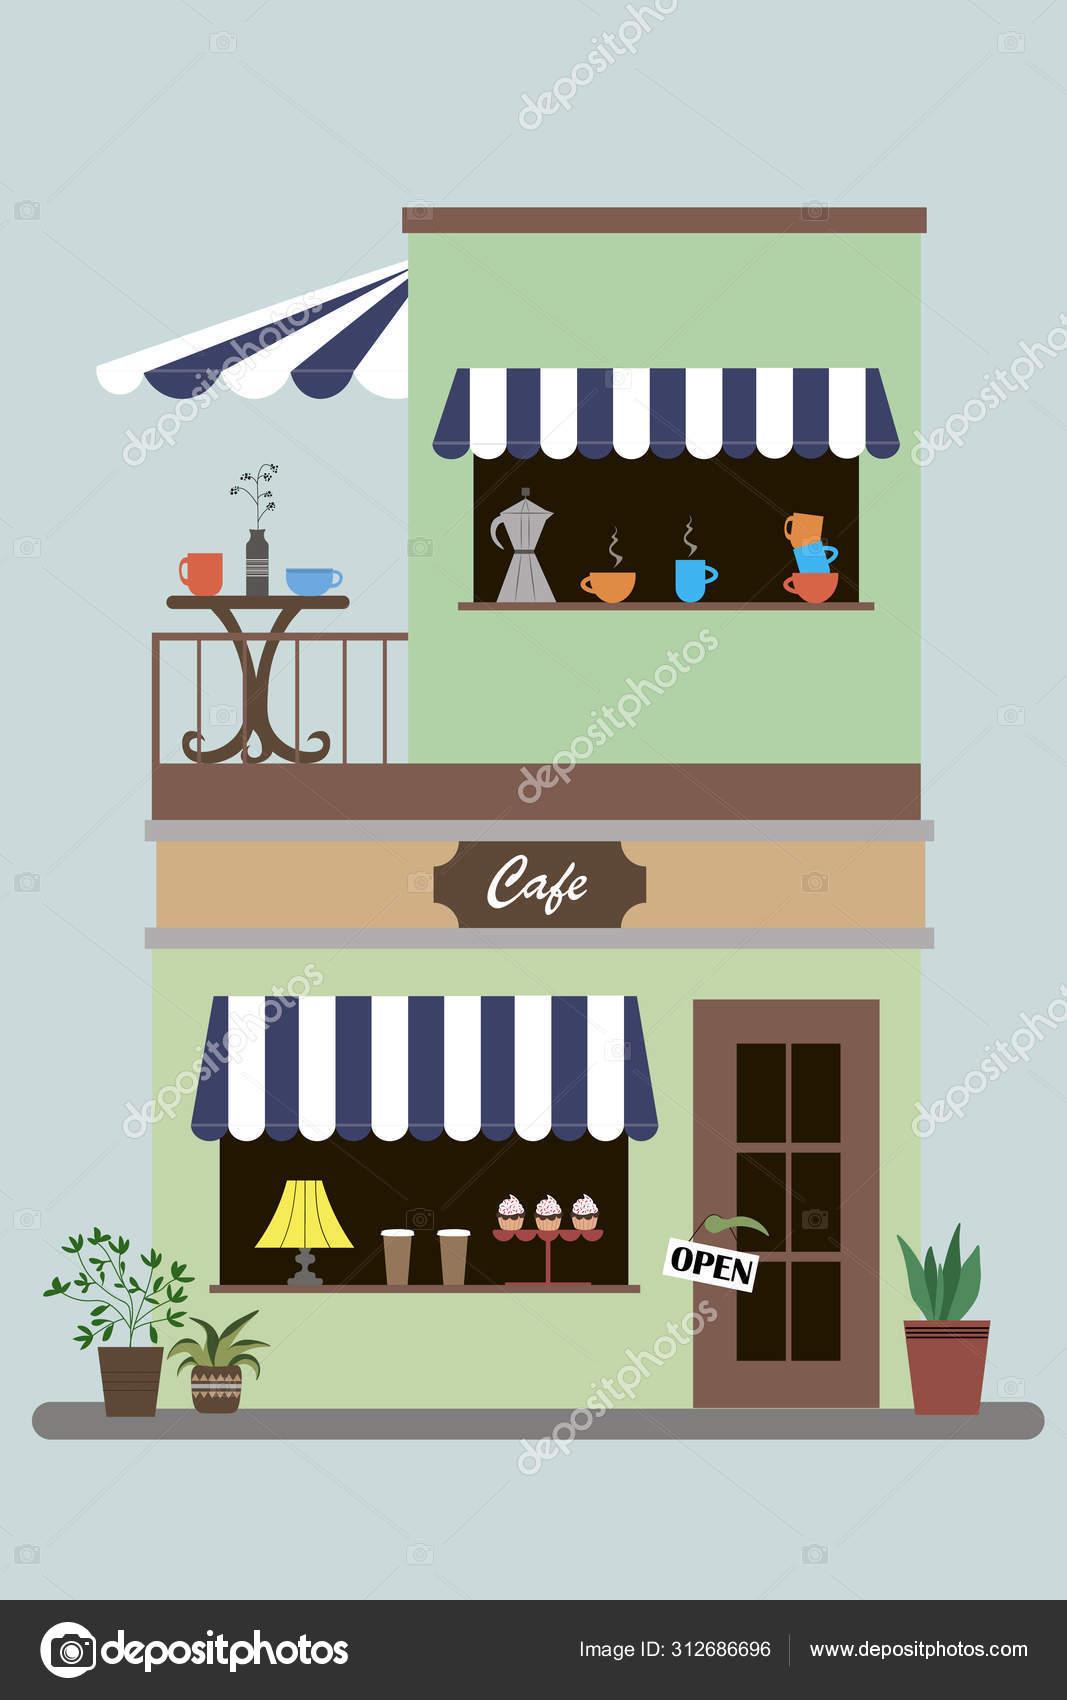 Cafe Shop Exterior Street Restraunt Building Stock Vector C Uu777 312686696